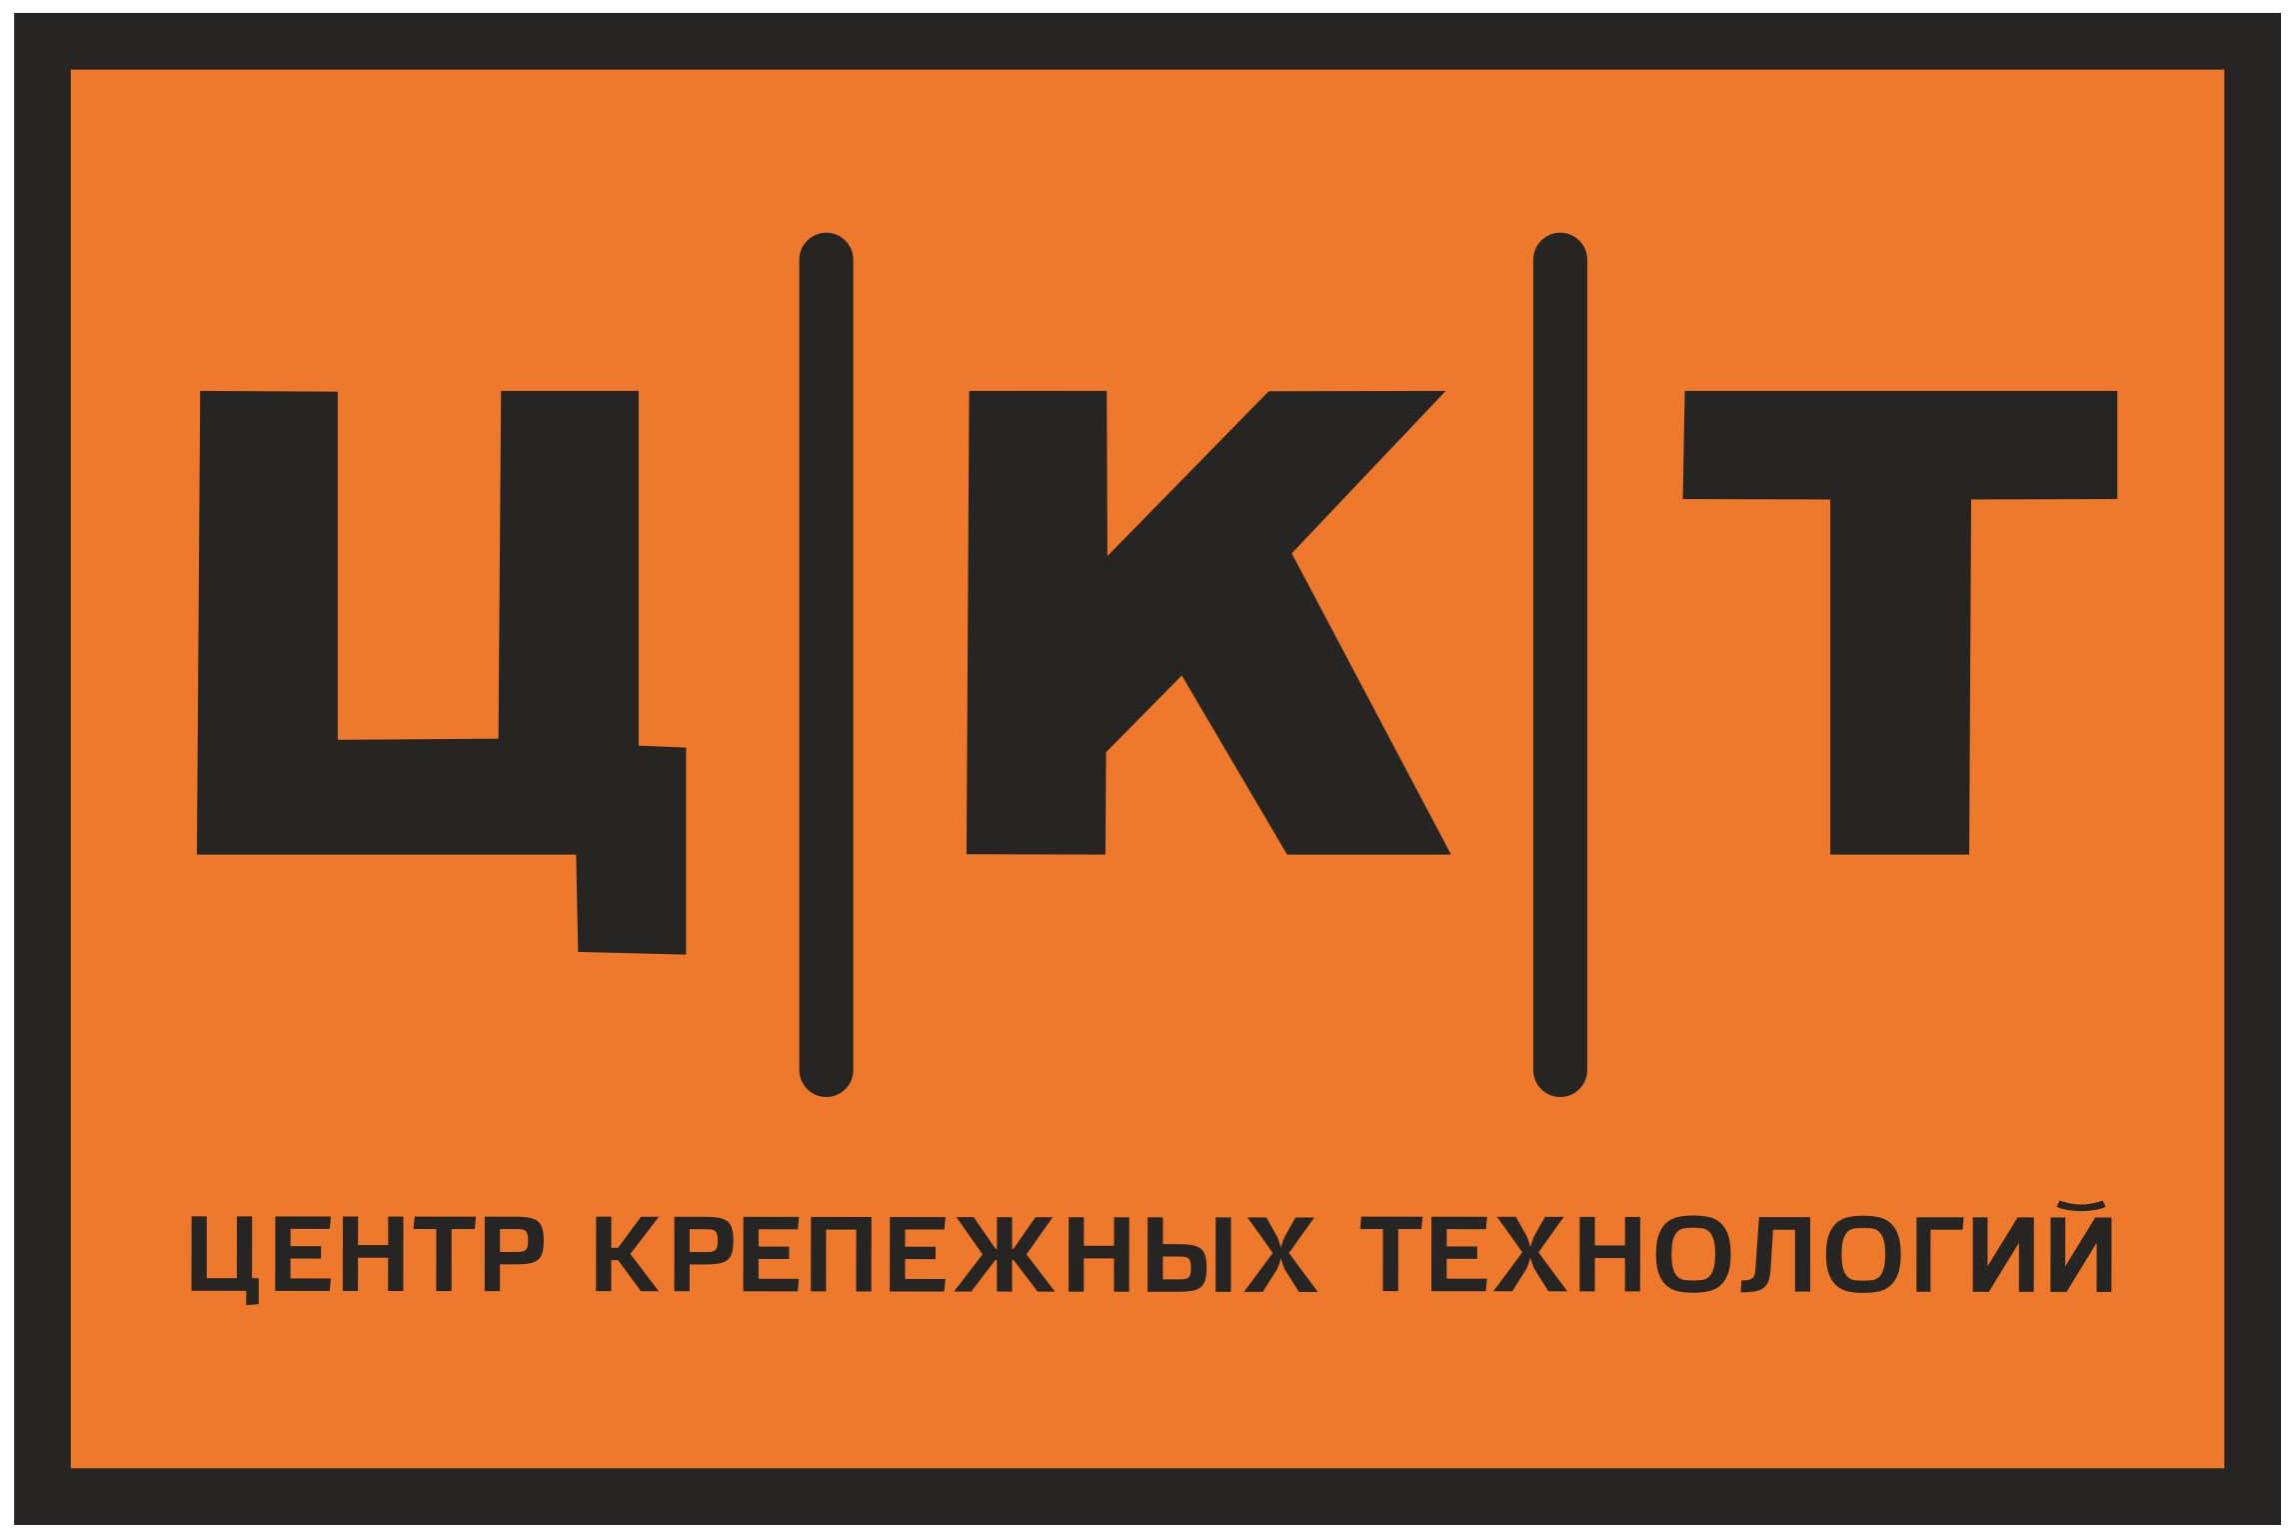 Центр Крепежных Технологий